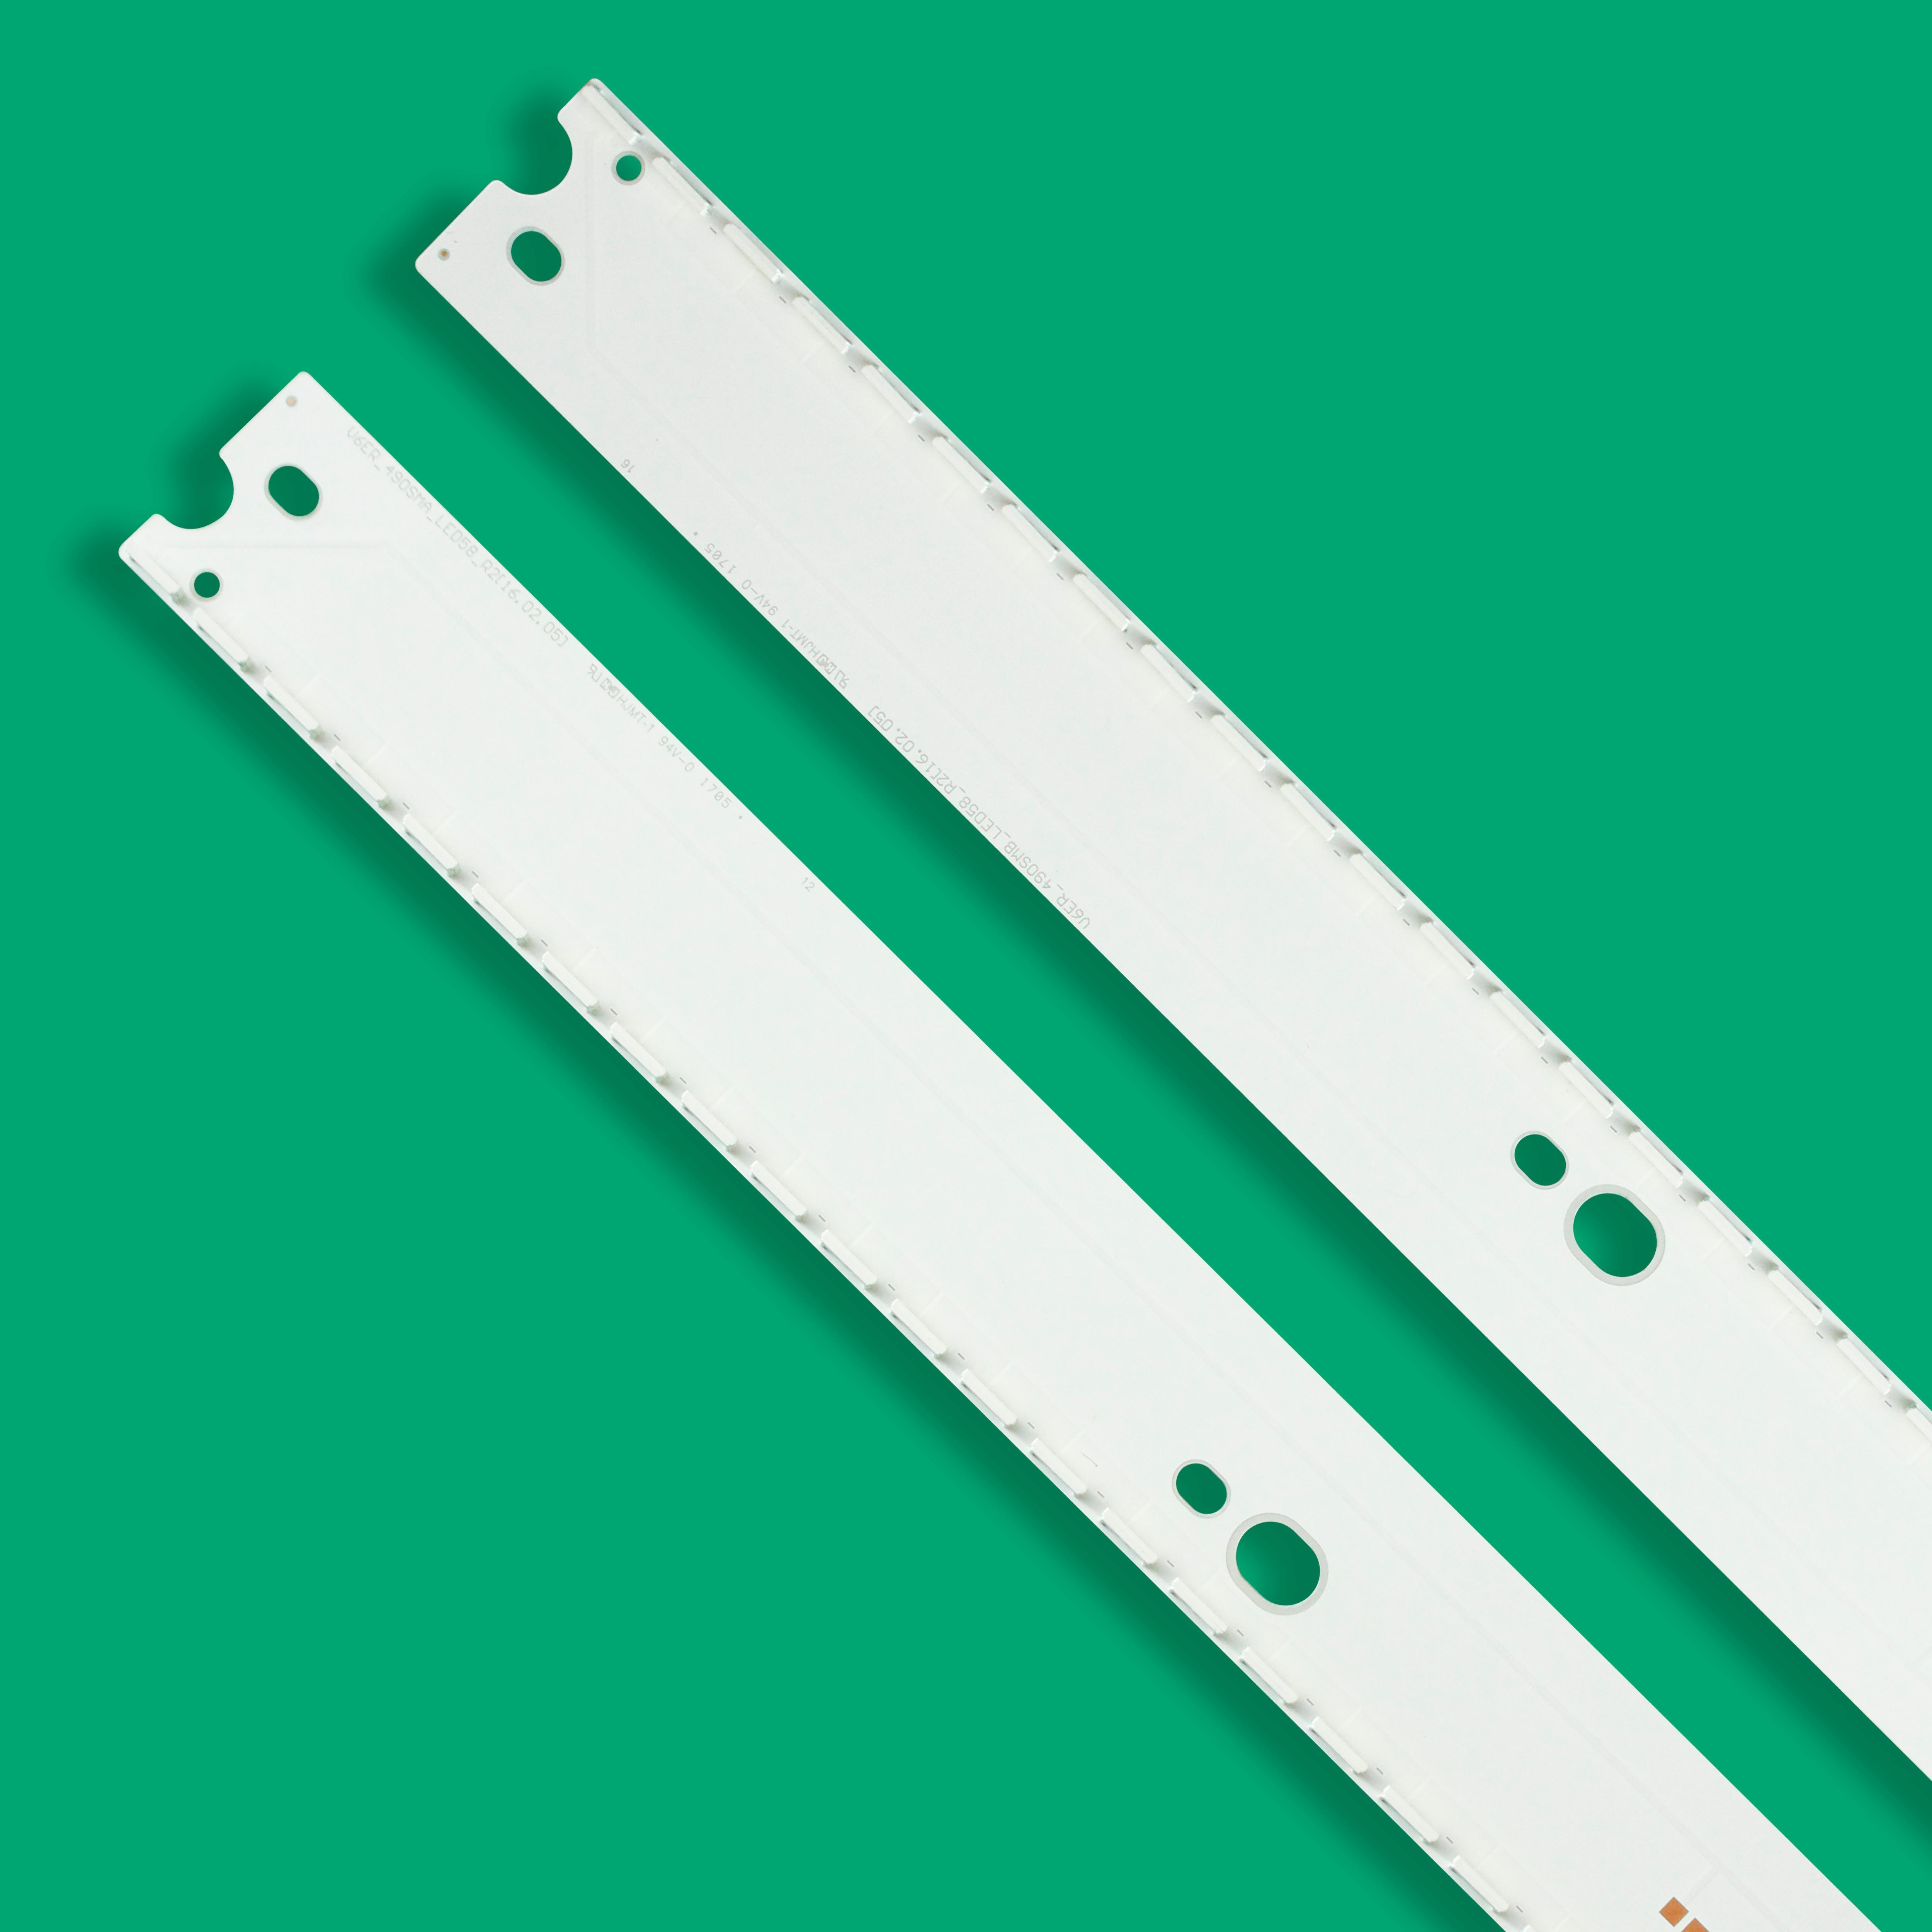 10 PCS LED backlight strip for  UE49KU6652 UE49MU6672 UE49MU6479 UE49MU6475 UE49MU6502 UE49MU6670 UE49MU6649 CY-KK049HGLV3H enlarge